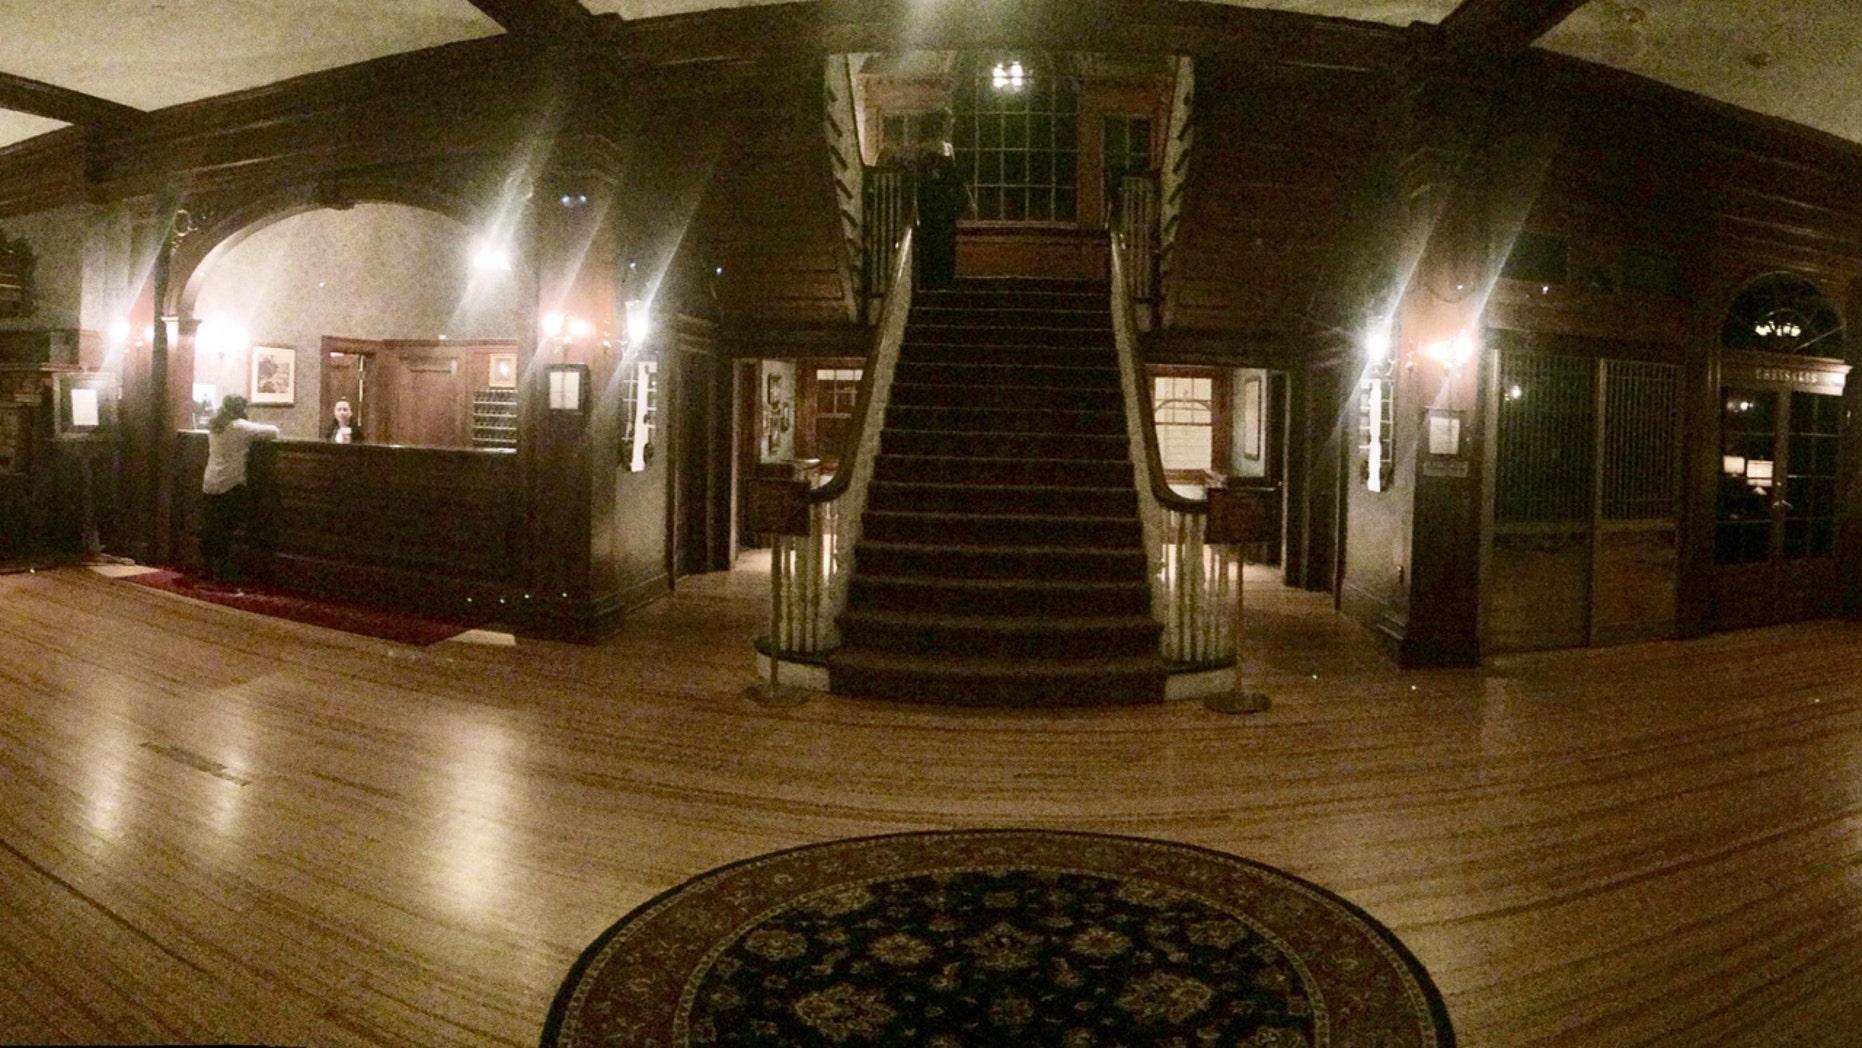 Stanley Hotel Rooms Haunted